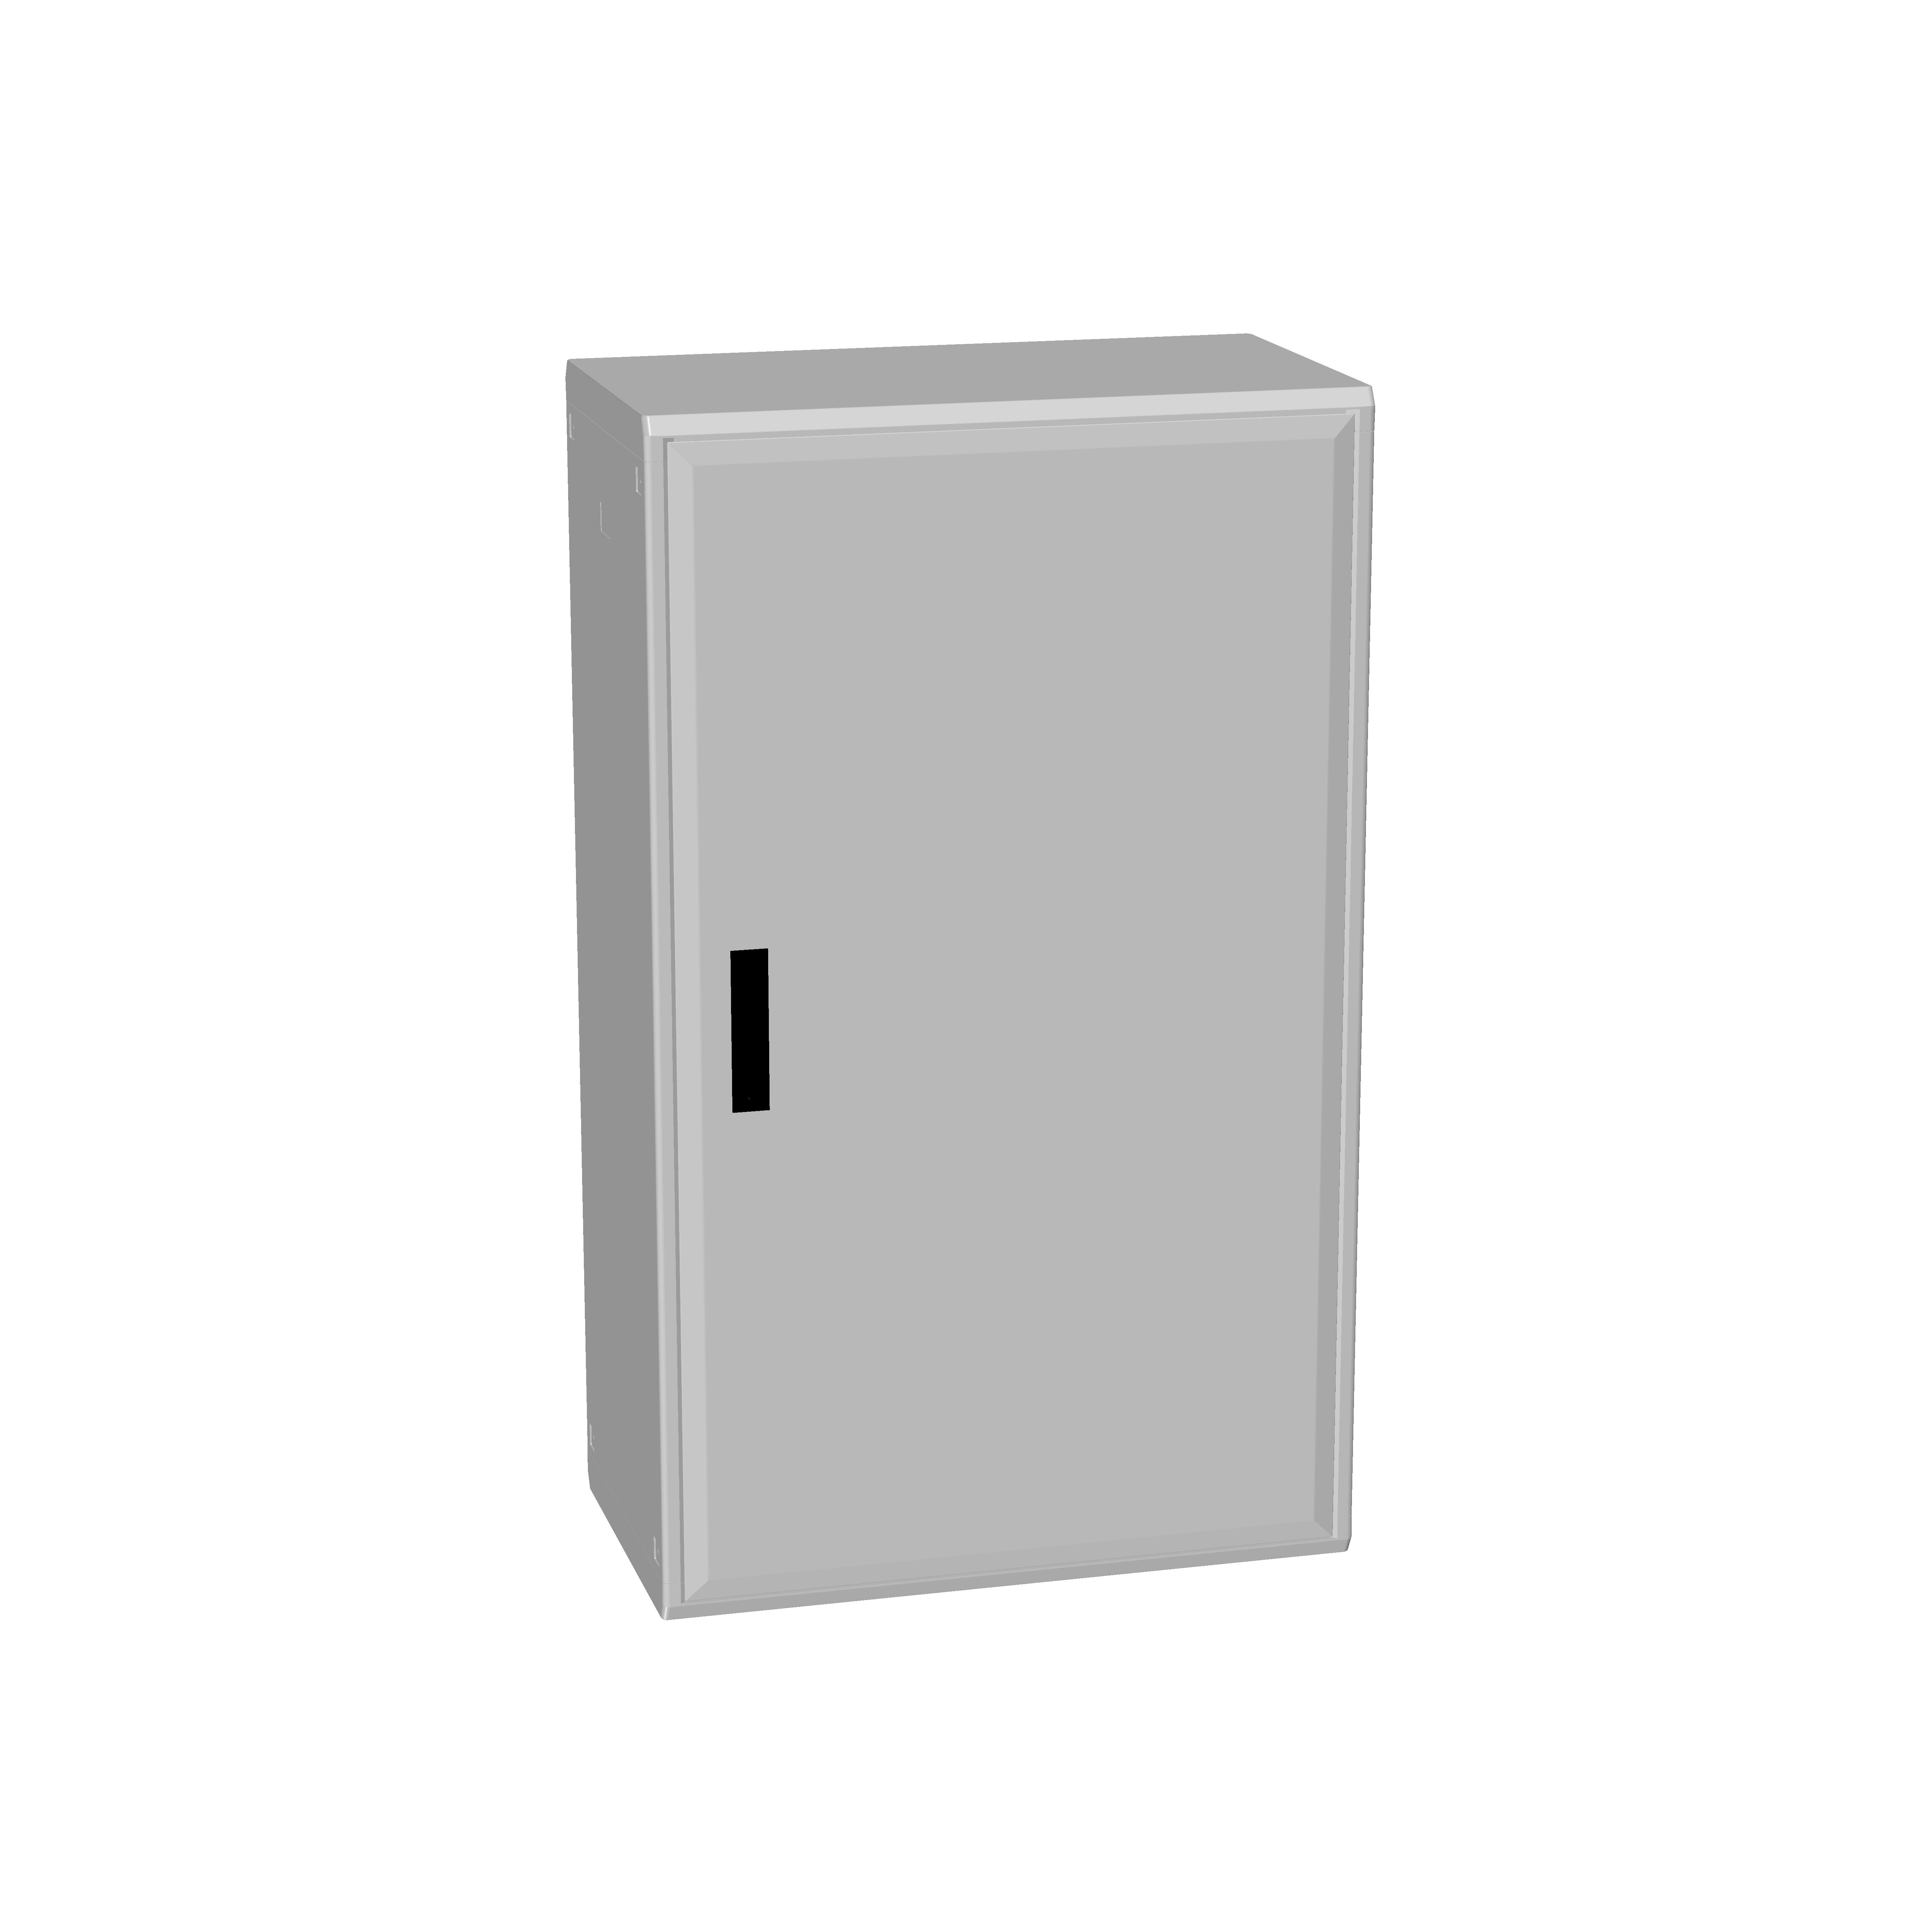 1 Stk Polyesterschrank, eintürig, 1250x750x432 POCC5340--